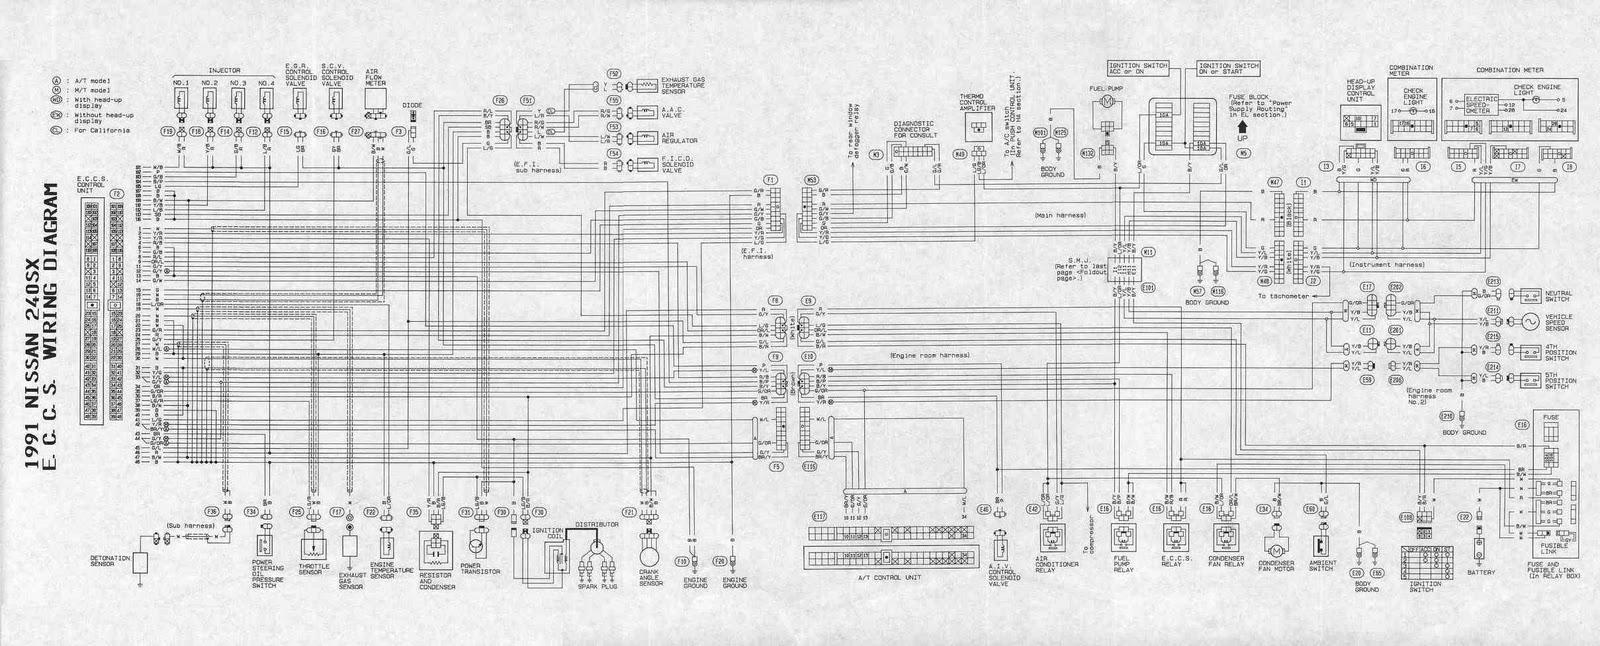 nissan 240sx radio wiring diagram tone control wiring diagram gas, electrical diagram, electrical wiring diagram for nissan